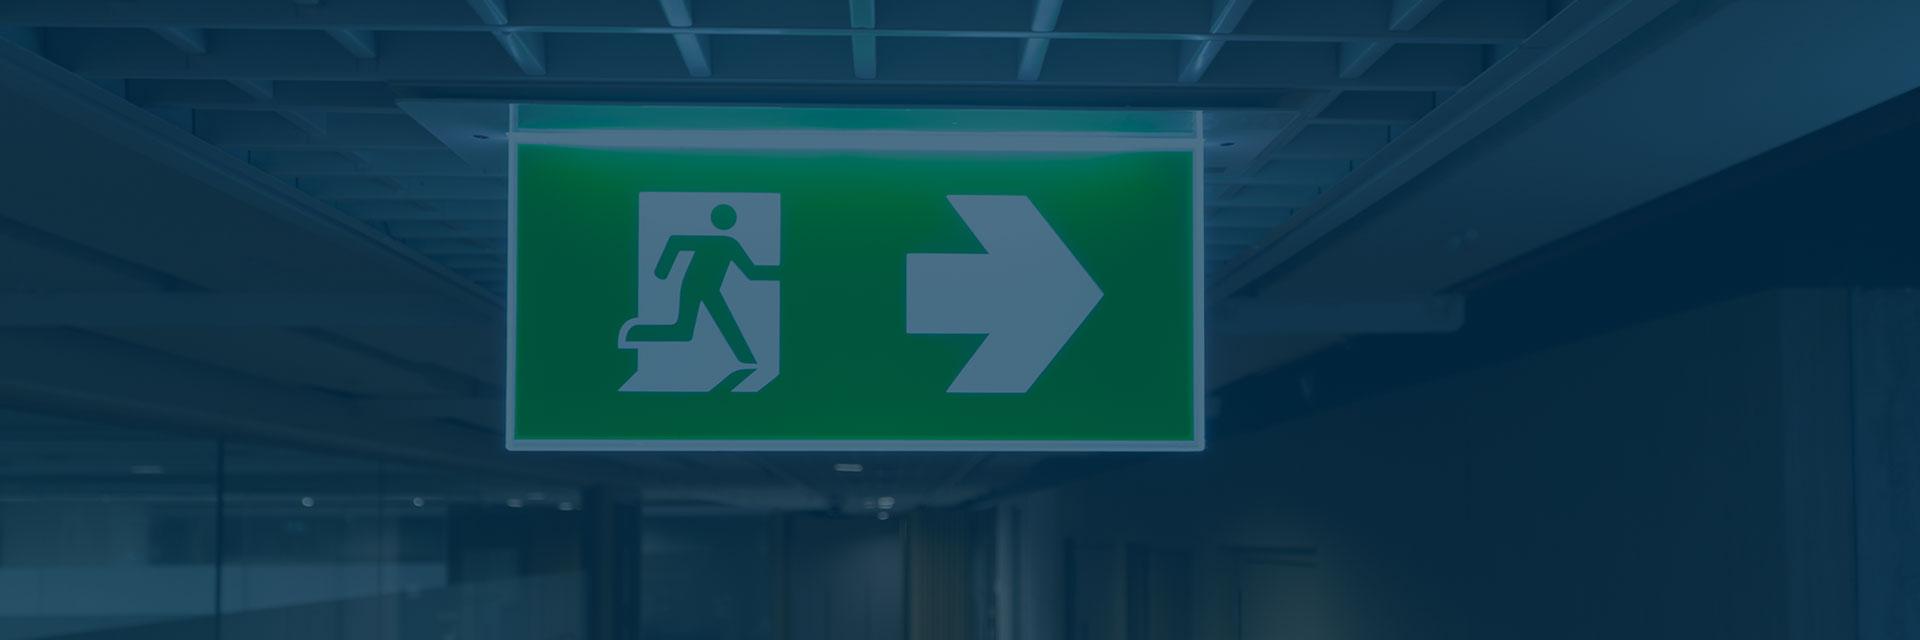 Emergency Lighting LCM Group